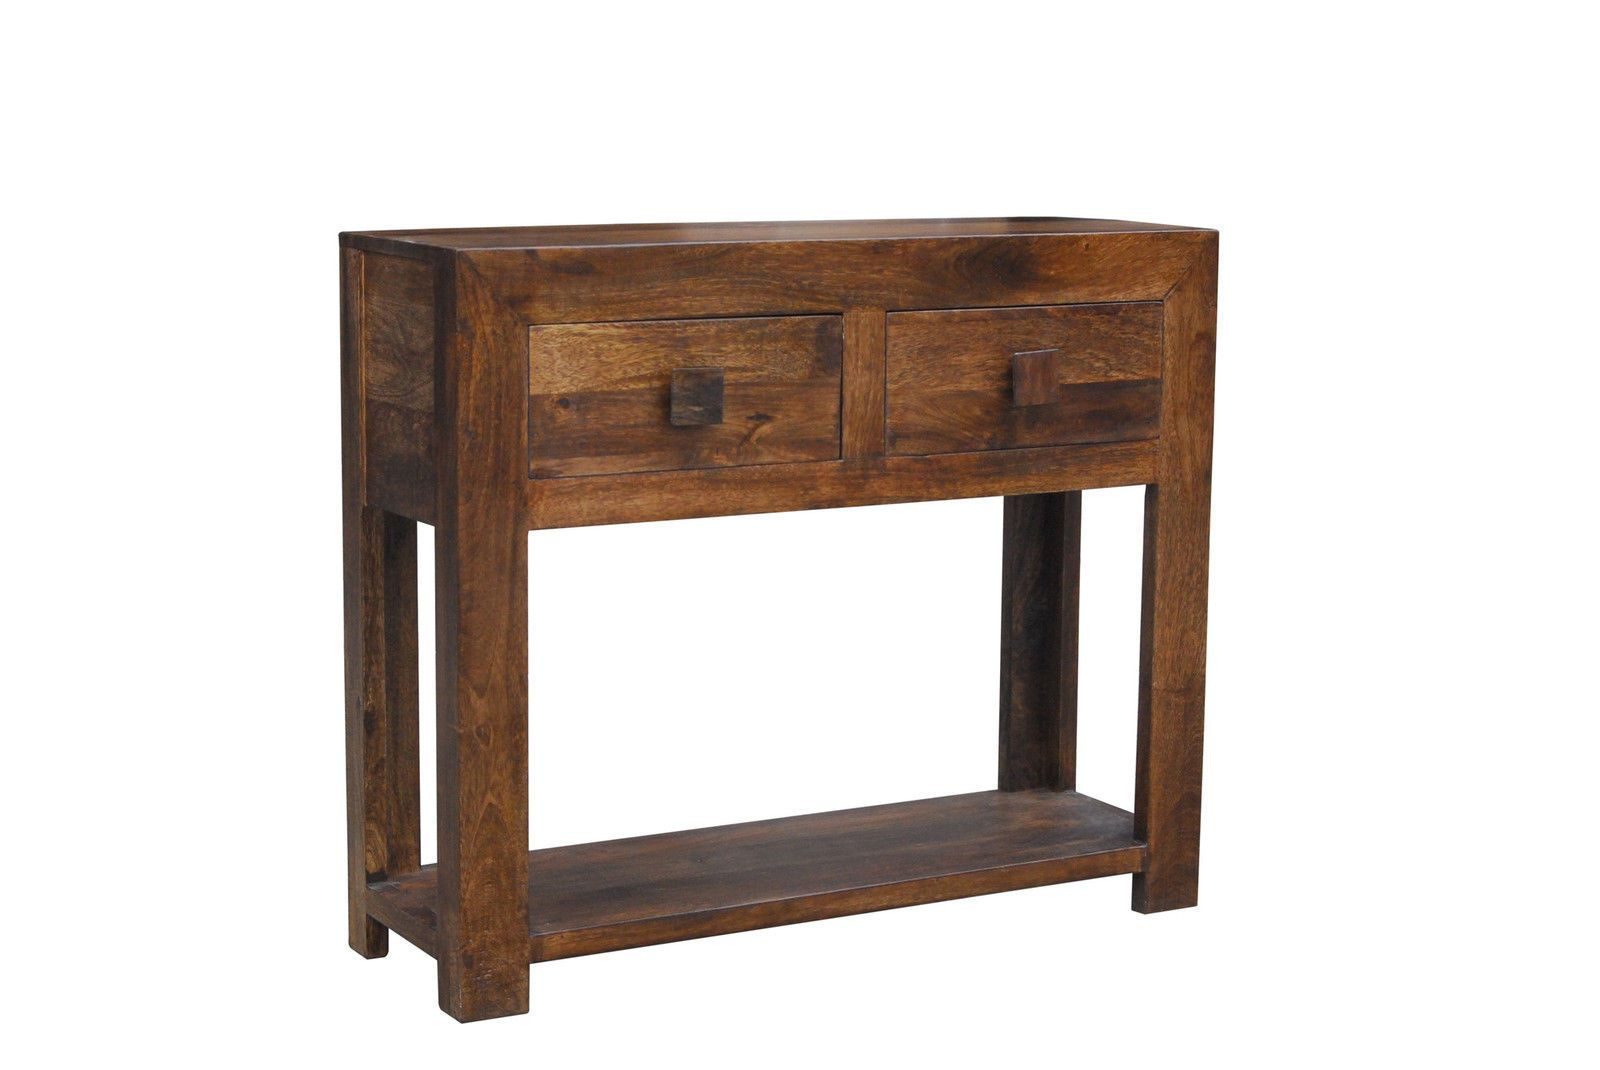 Brand New Dakota Console Table Solid Mango Wood Ssdcon2d Ebay Console Table Wooden Console Table Contemporary Console Table [ 1070 x 1600 Pixel ]